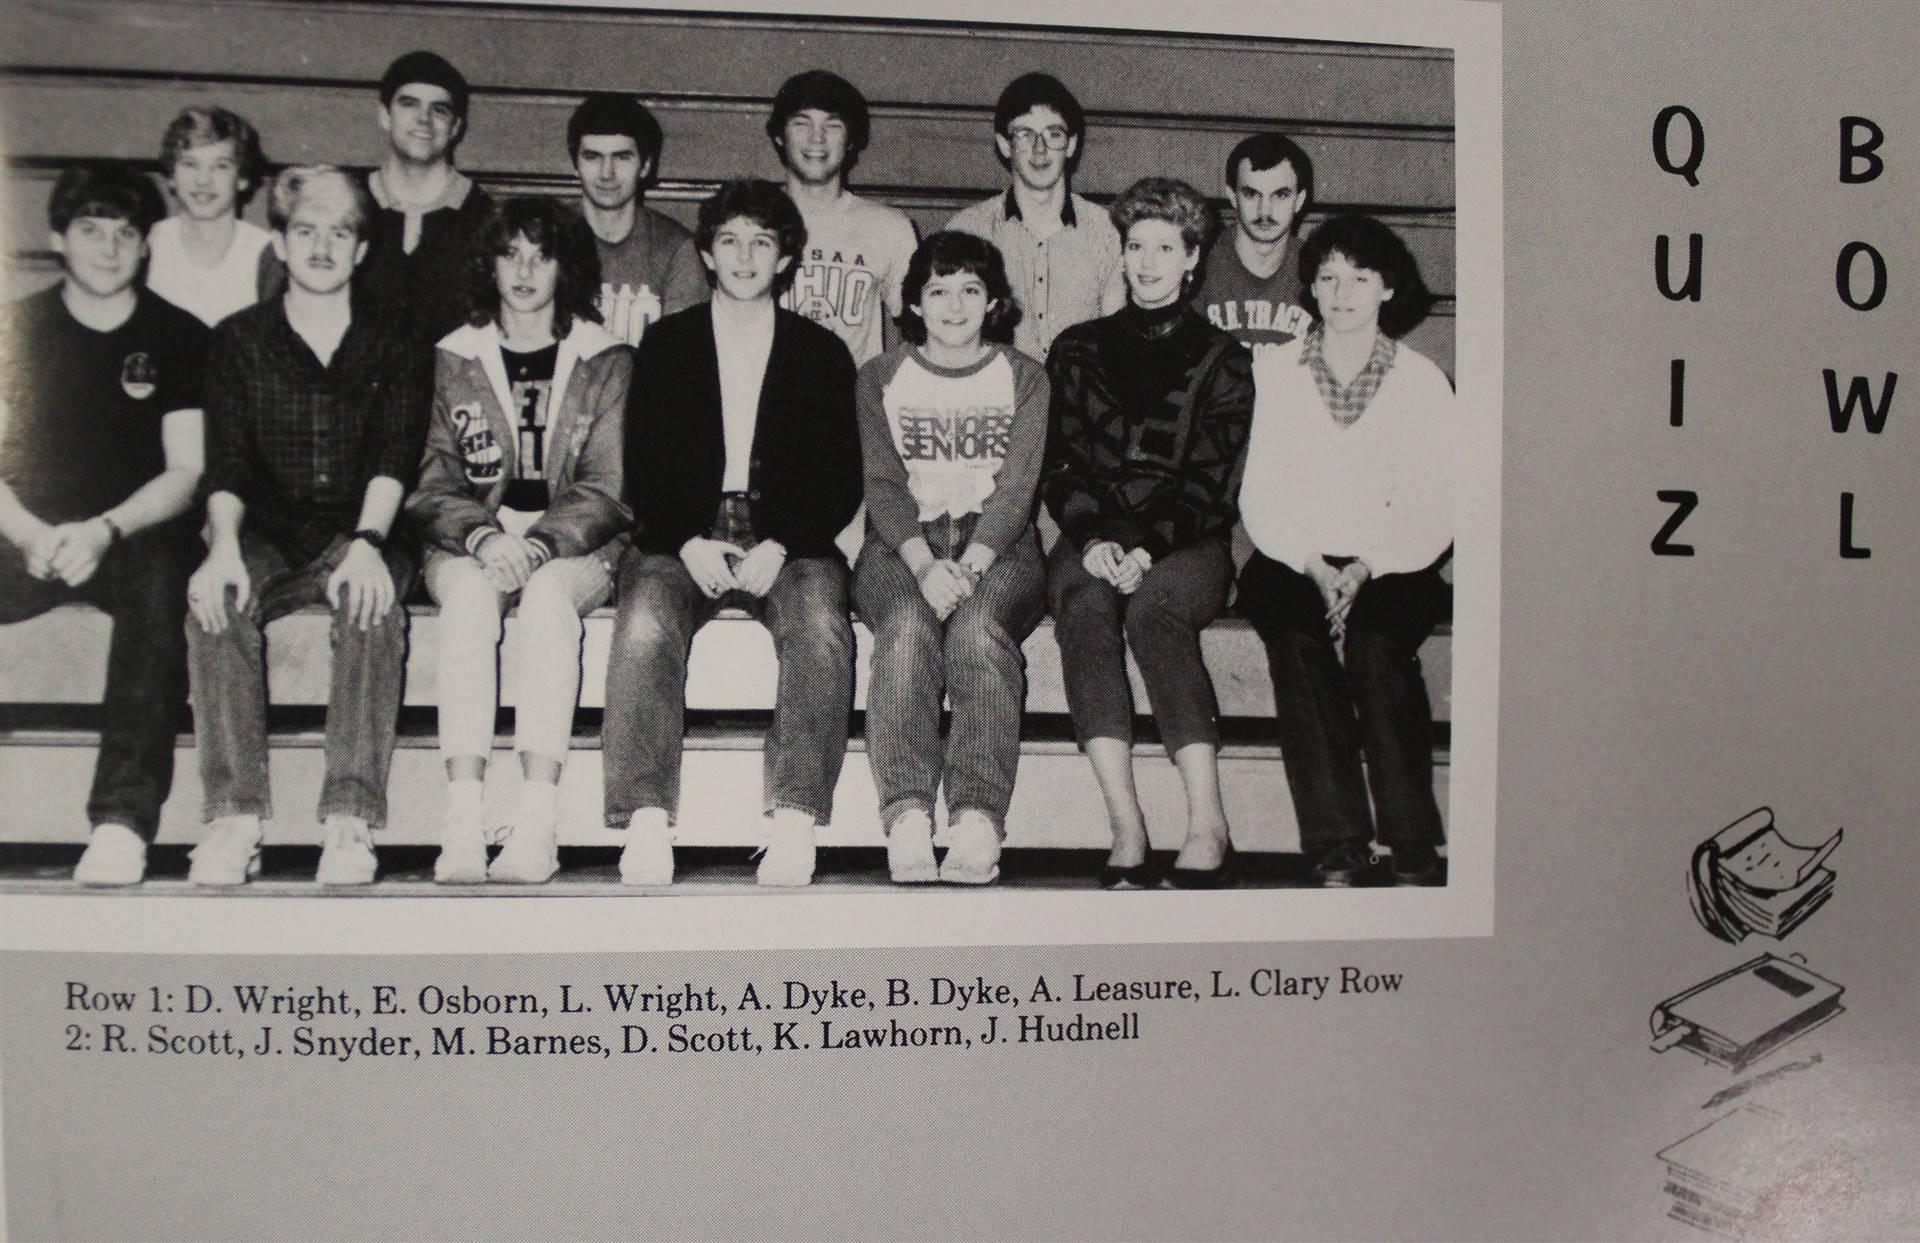 1986 Quiz Bowl